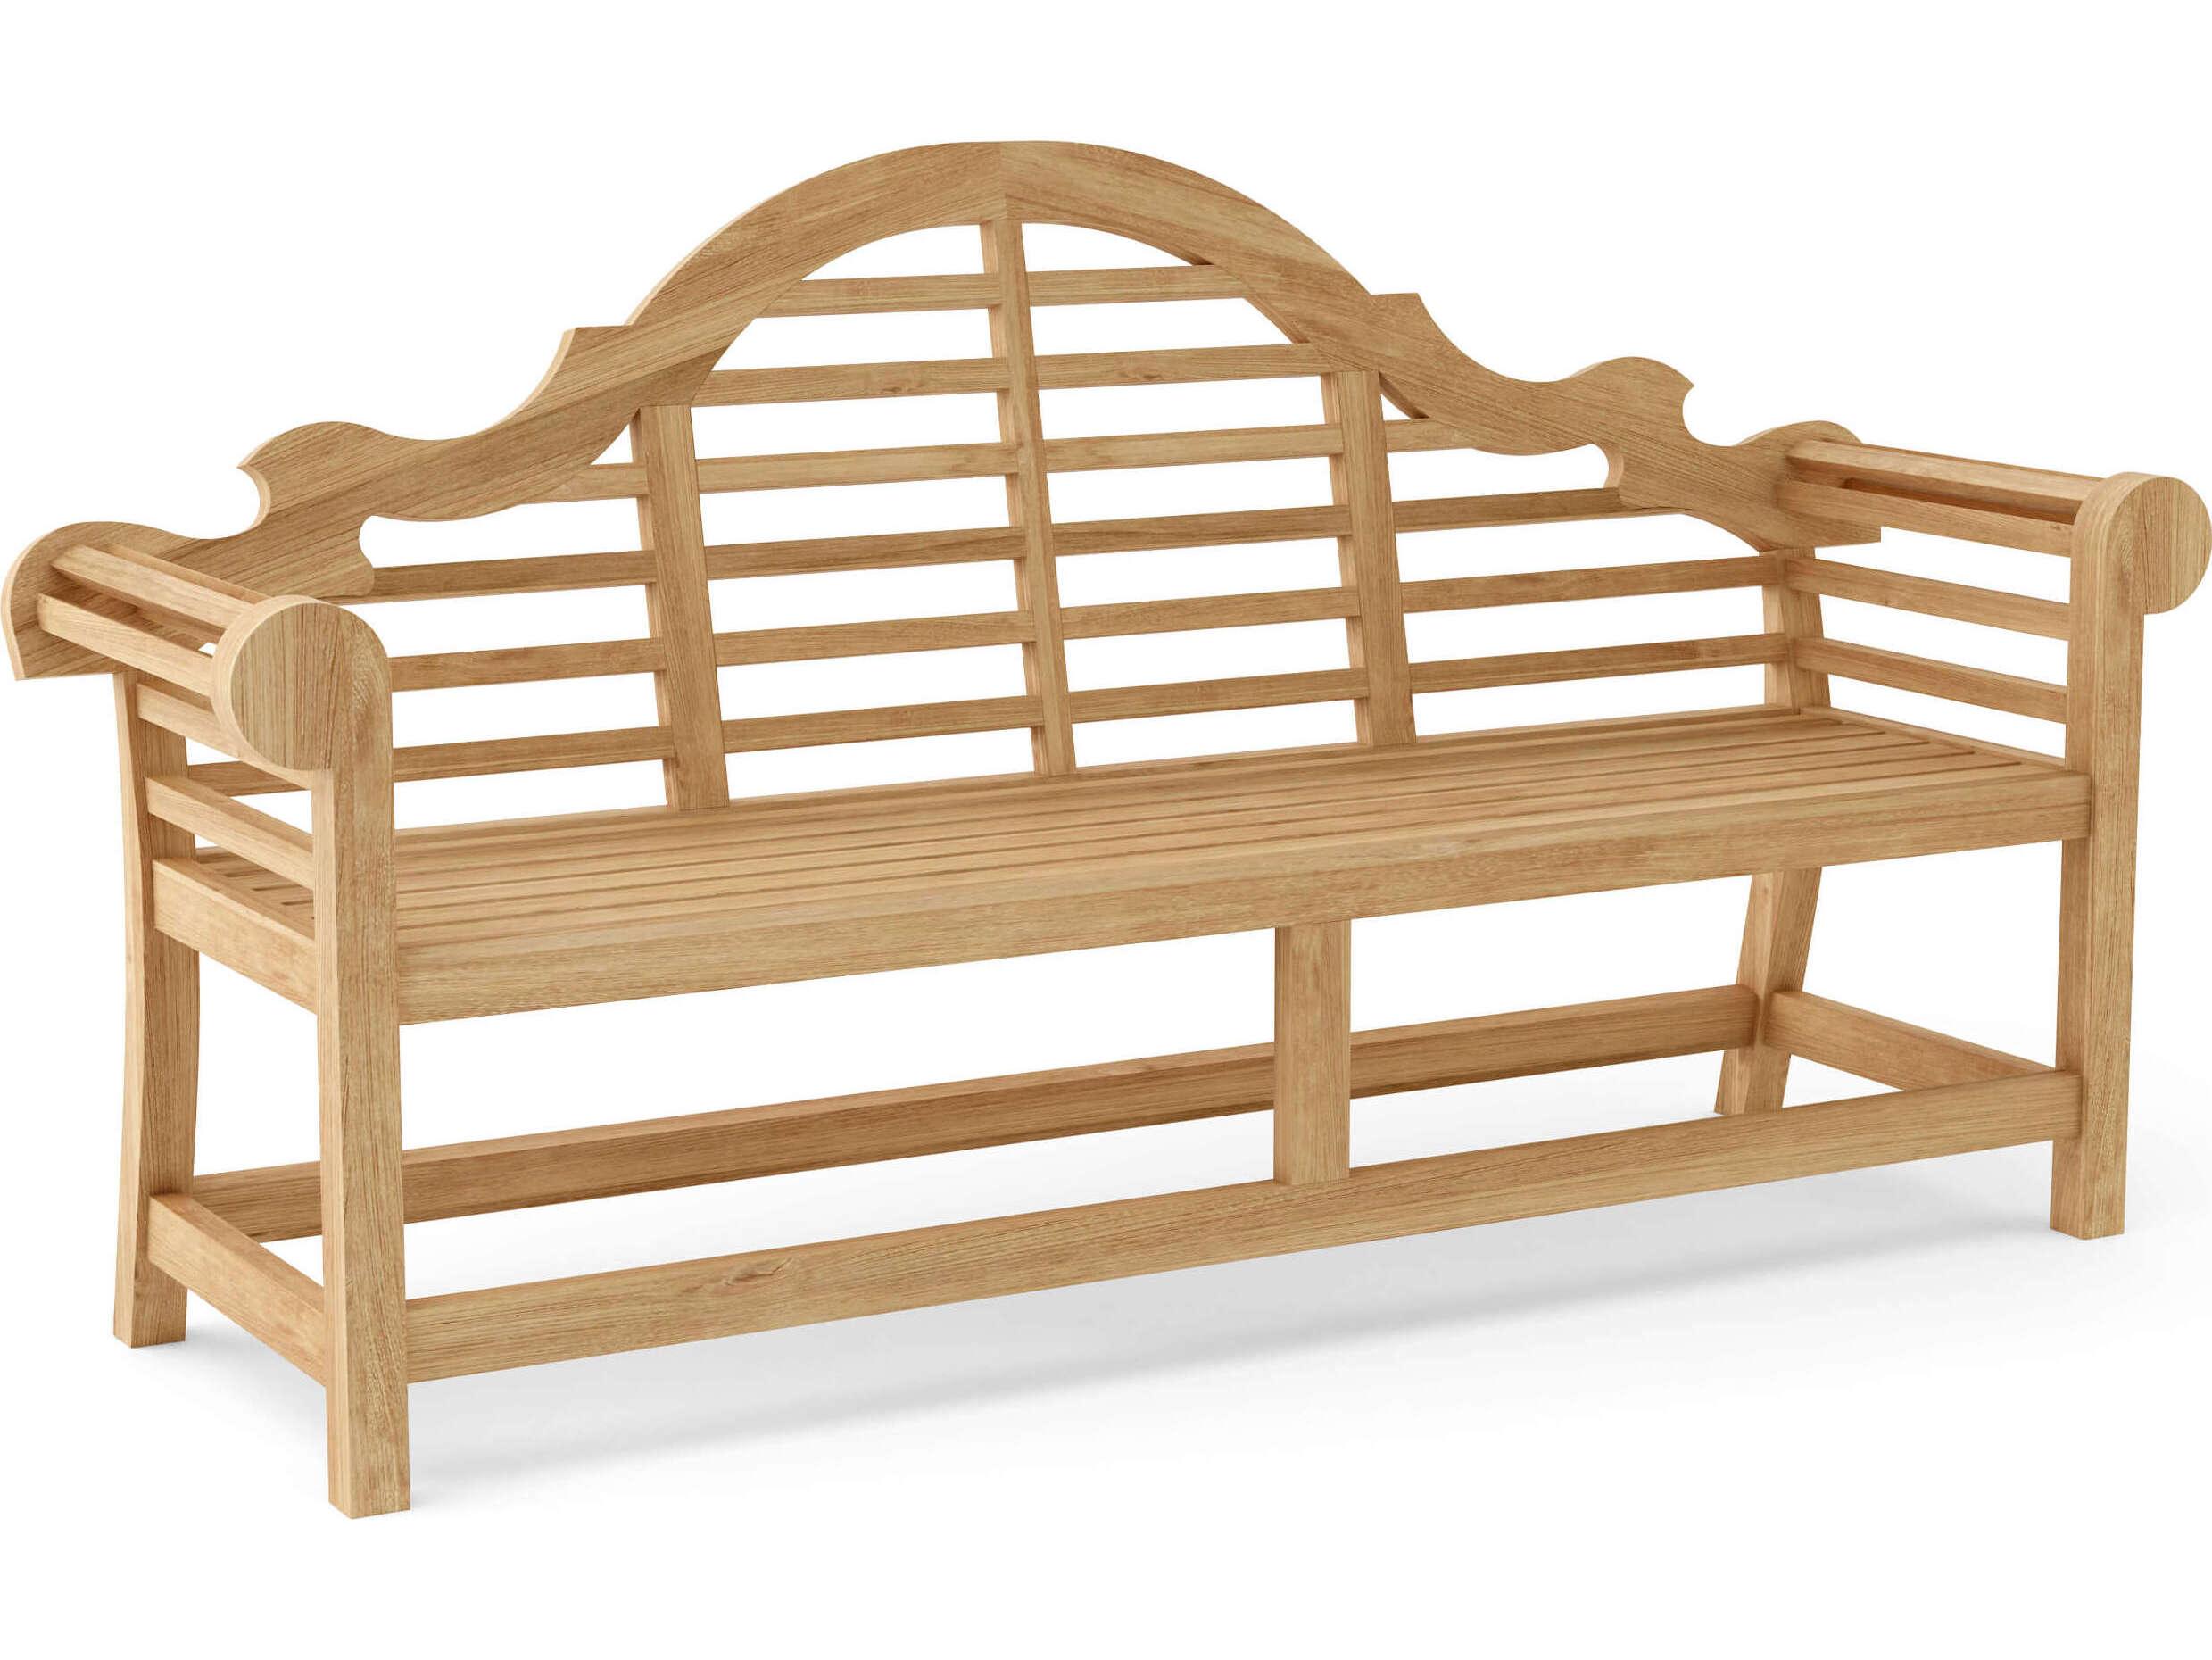 Anderson Teak Marlborough 3 Seater Bench Akbh196